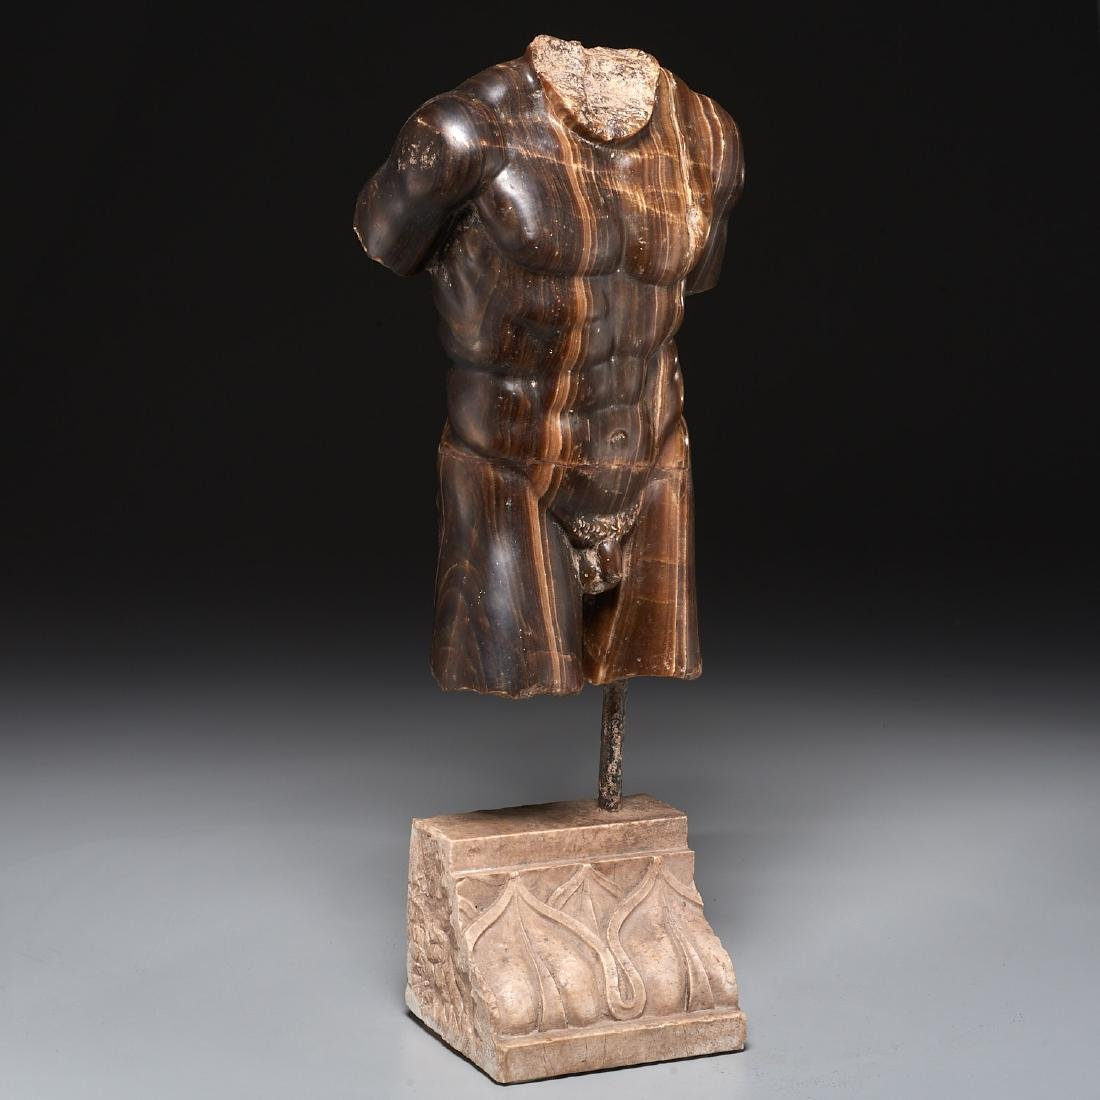 Greco-Roman style stone torso fragment